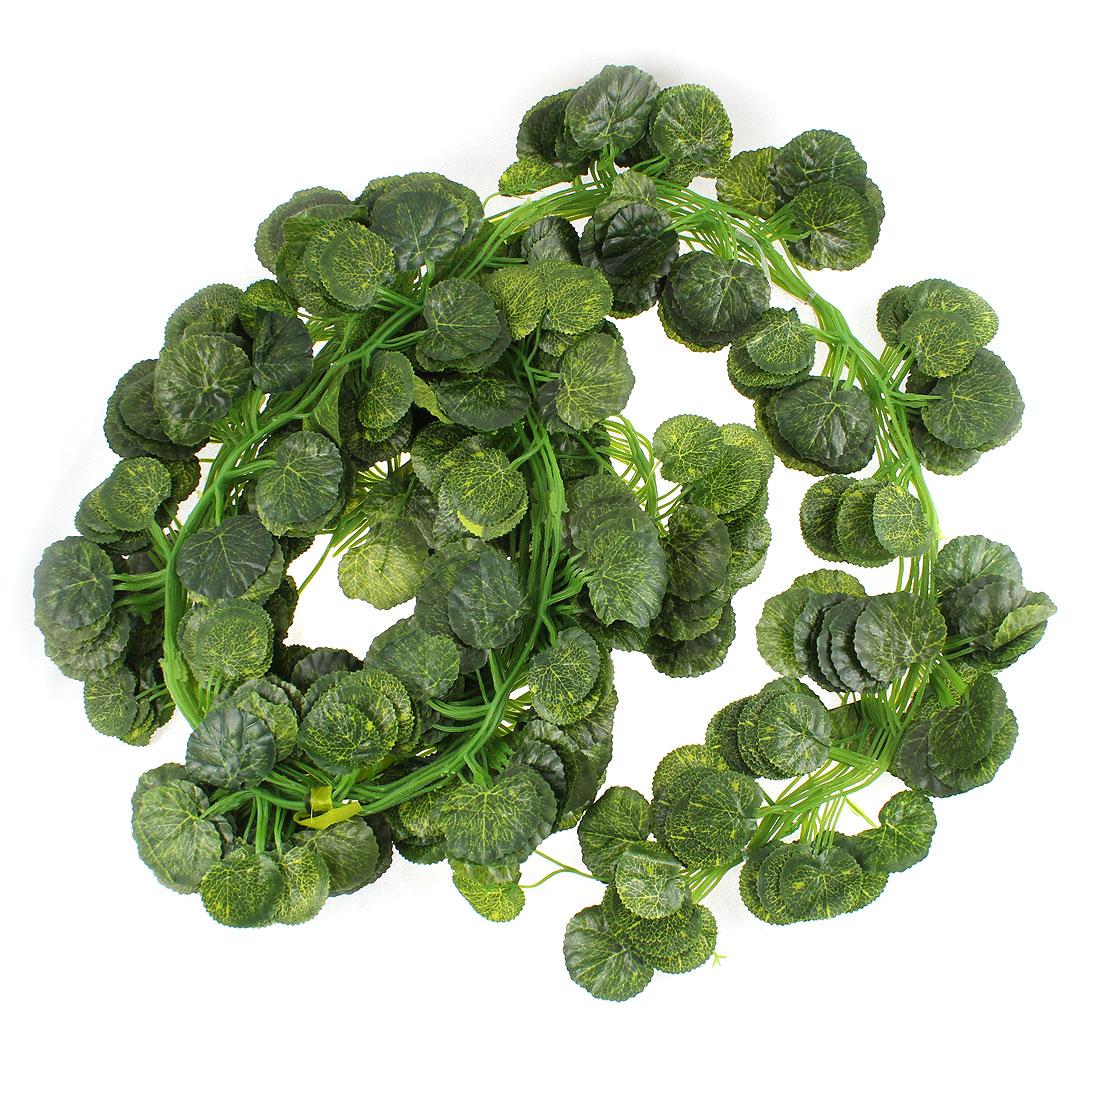 Artificial Ivy Leaf Garland Plants Vine Fake Foliage Decor 12 Pcs